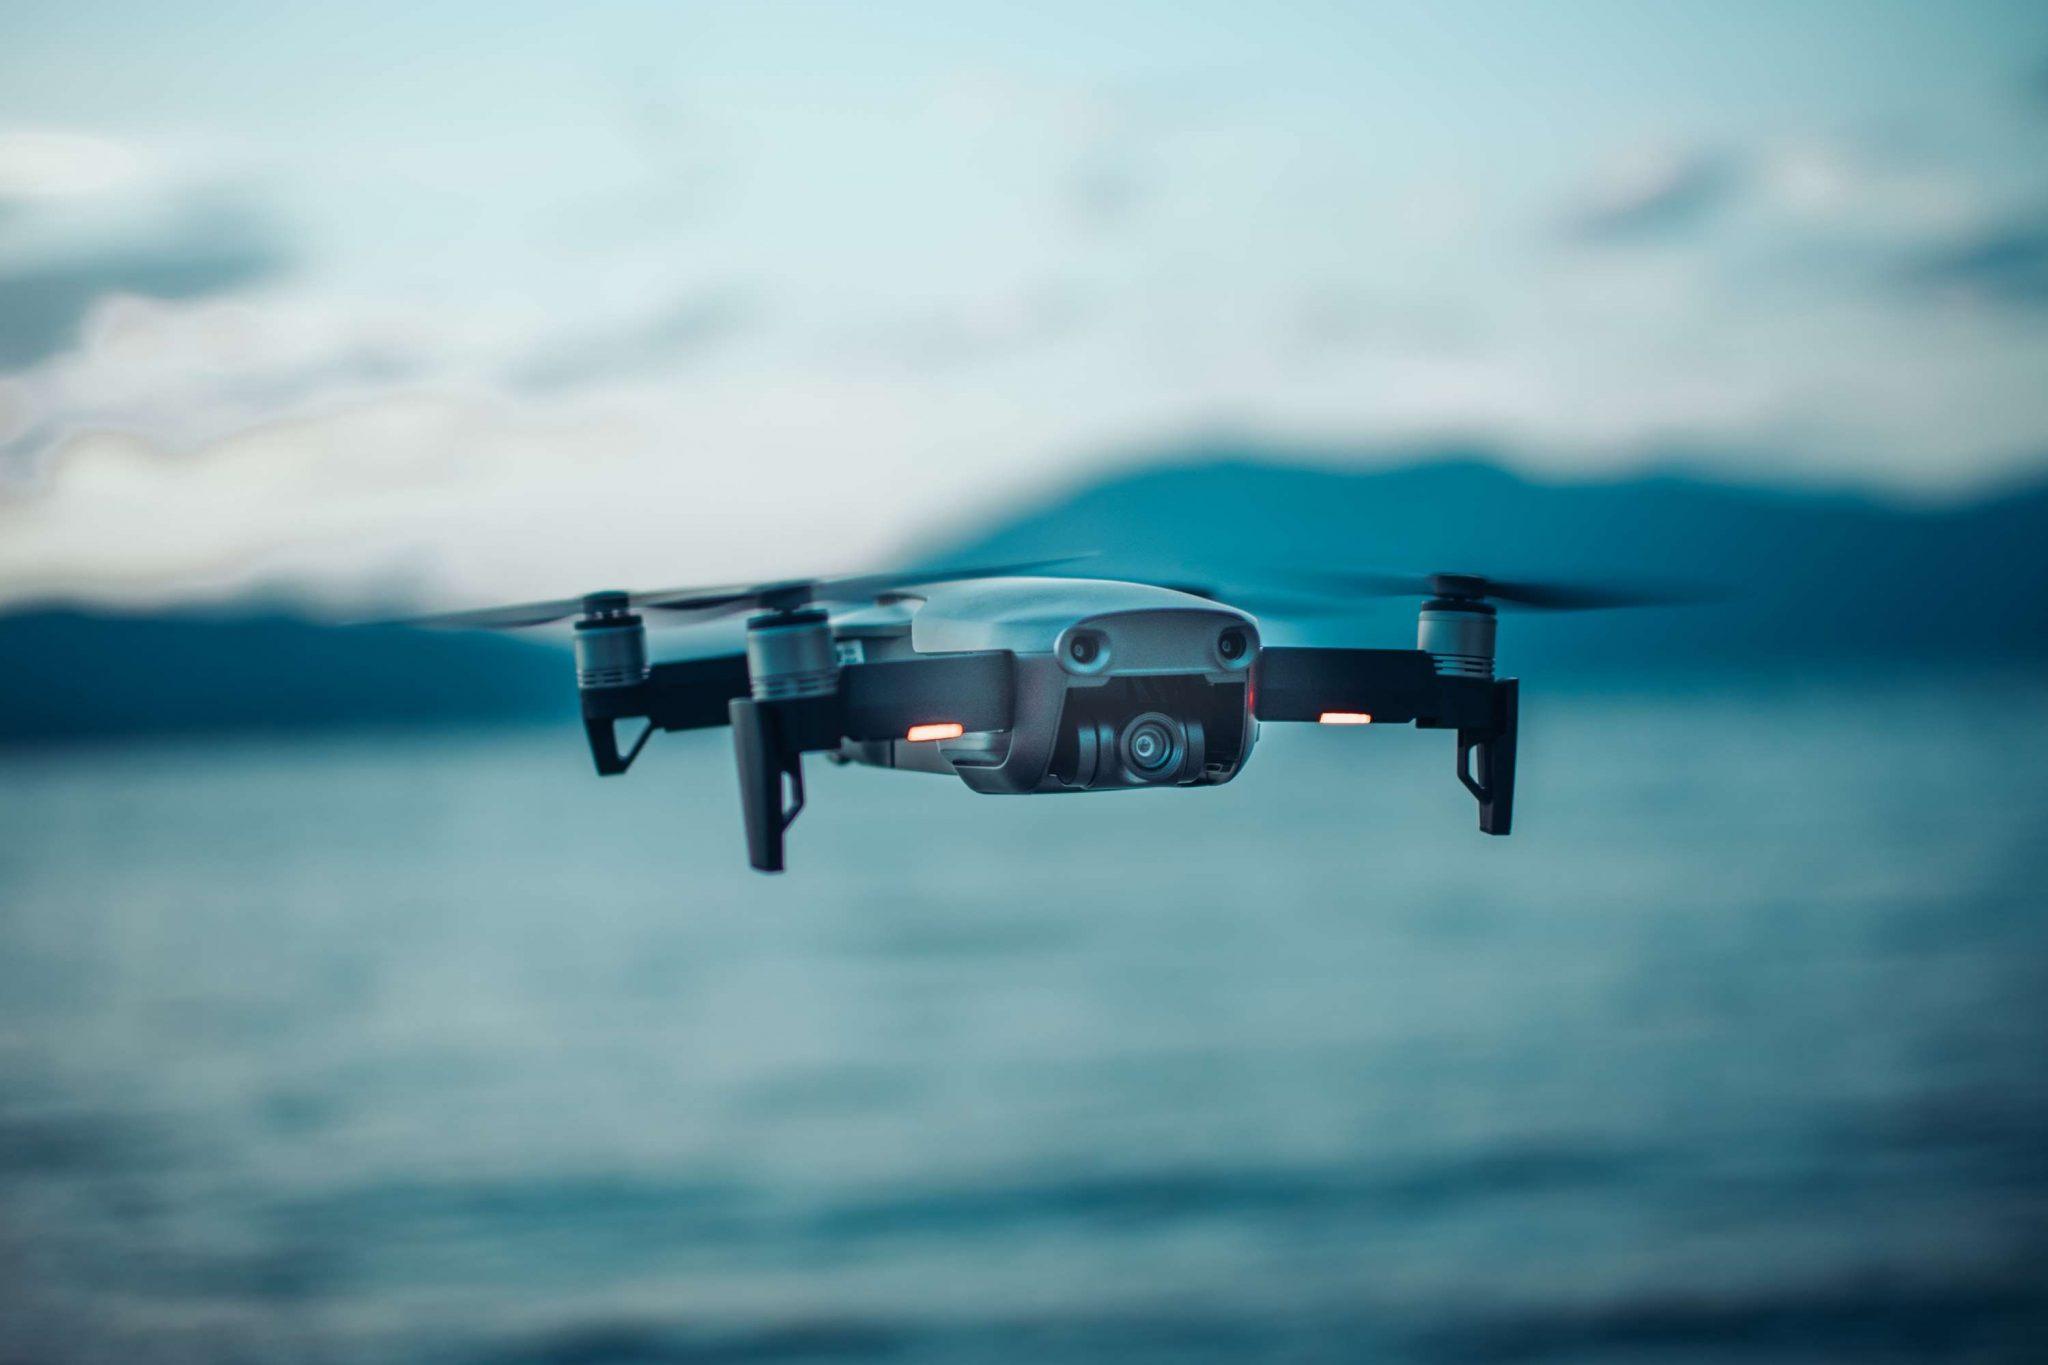 UAV racing